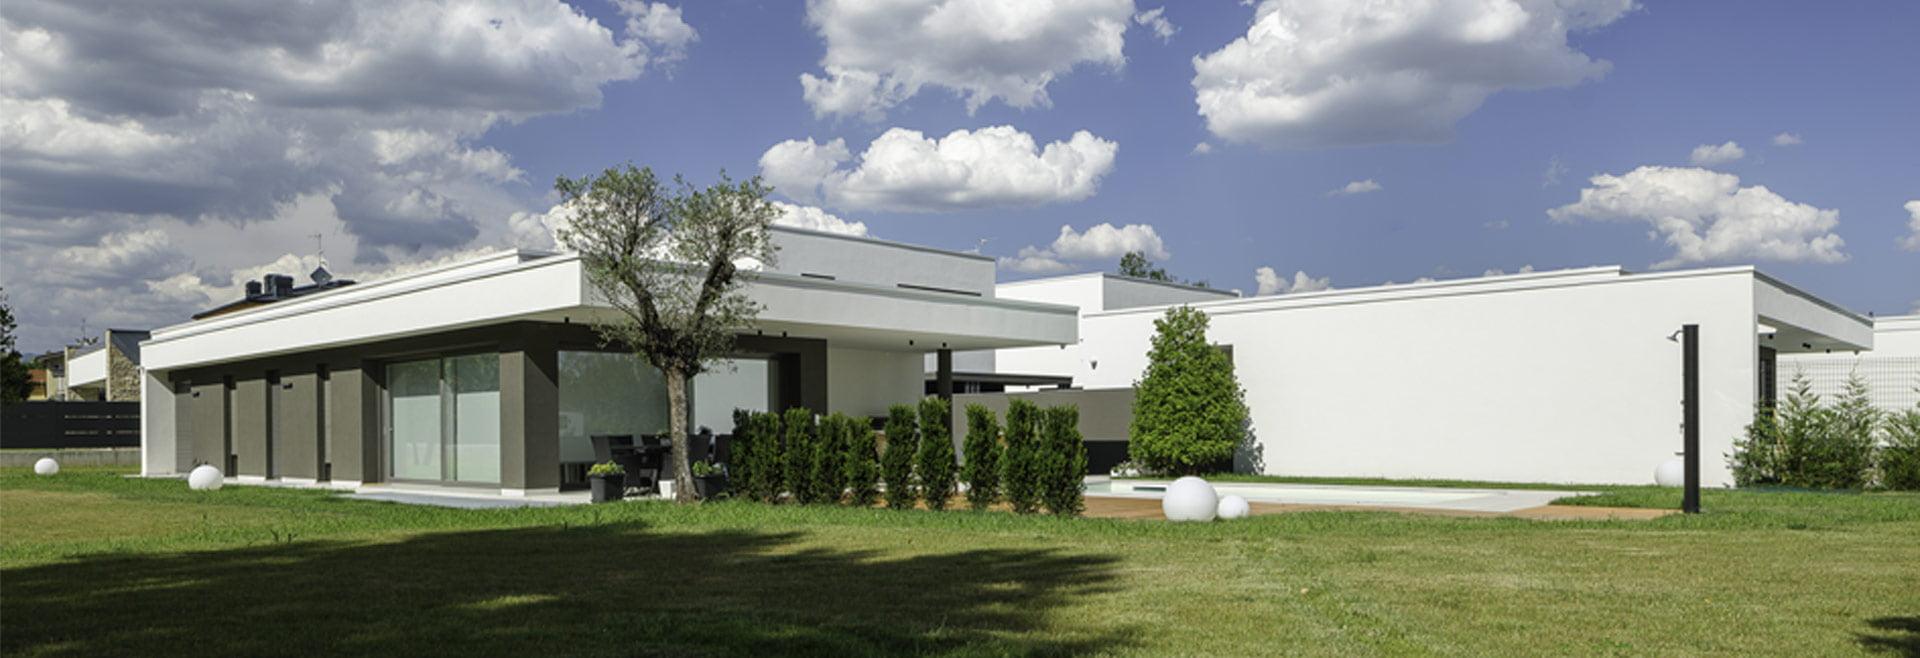 Parco Brembo